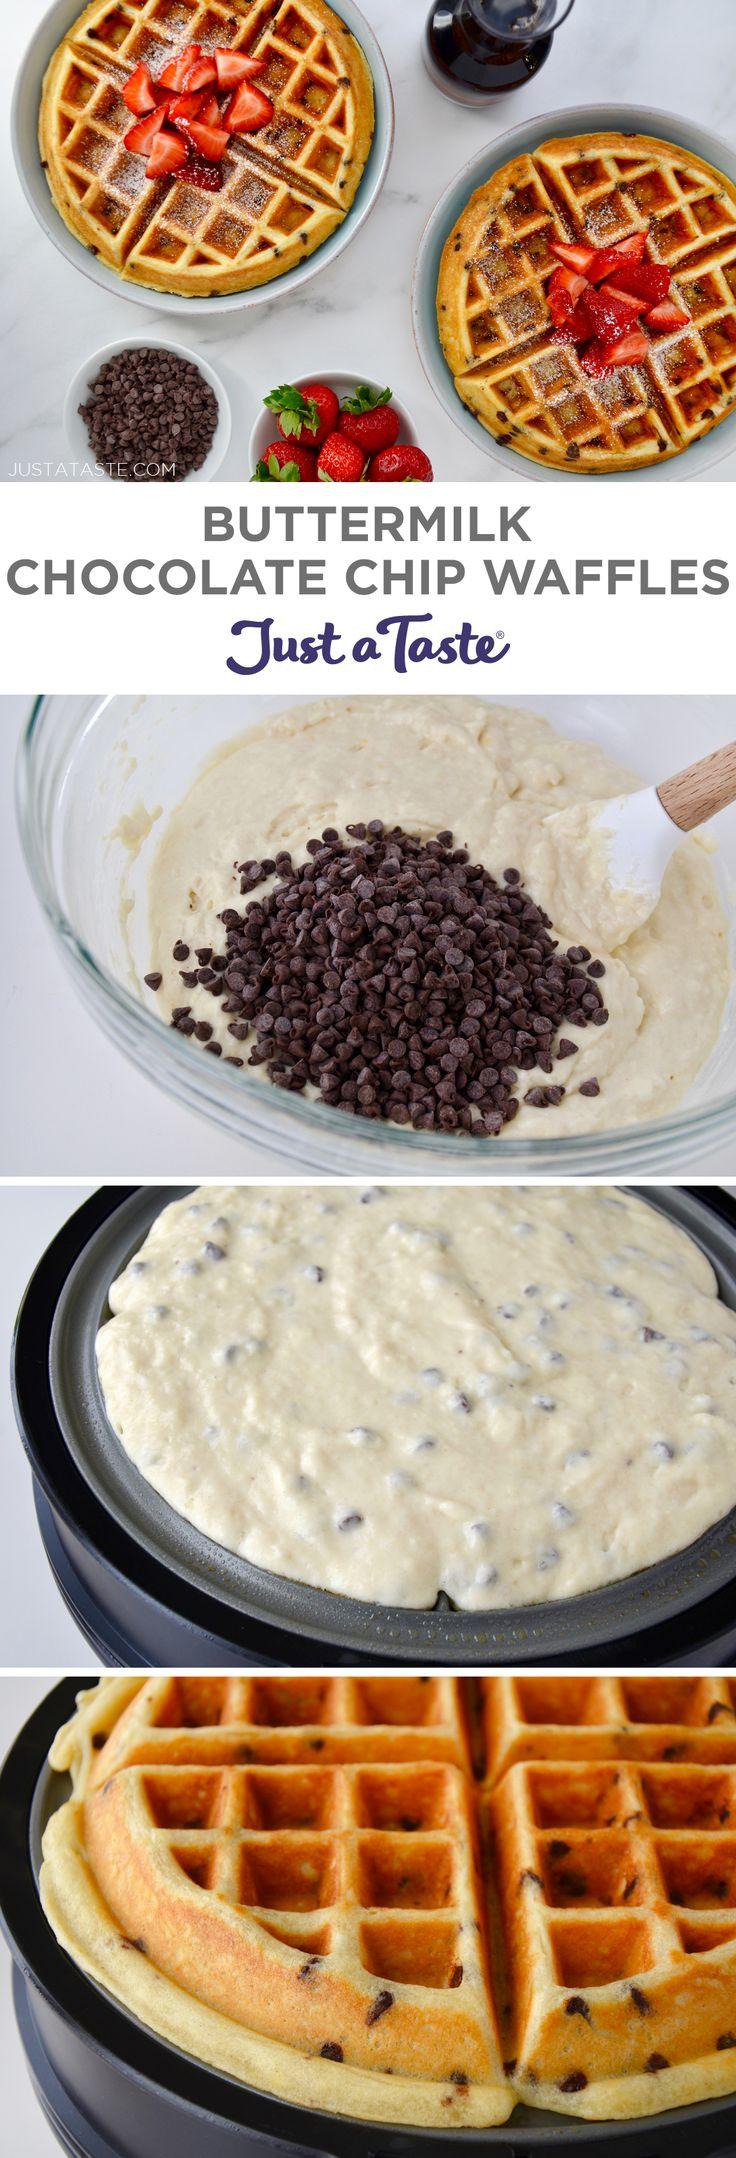 Buttermilk Chocolate Chip Waffles #recipe via justataste.com #waffles #breakfastrecipes